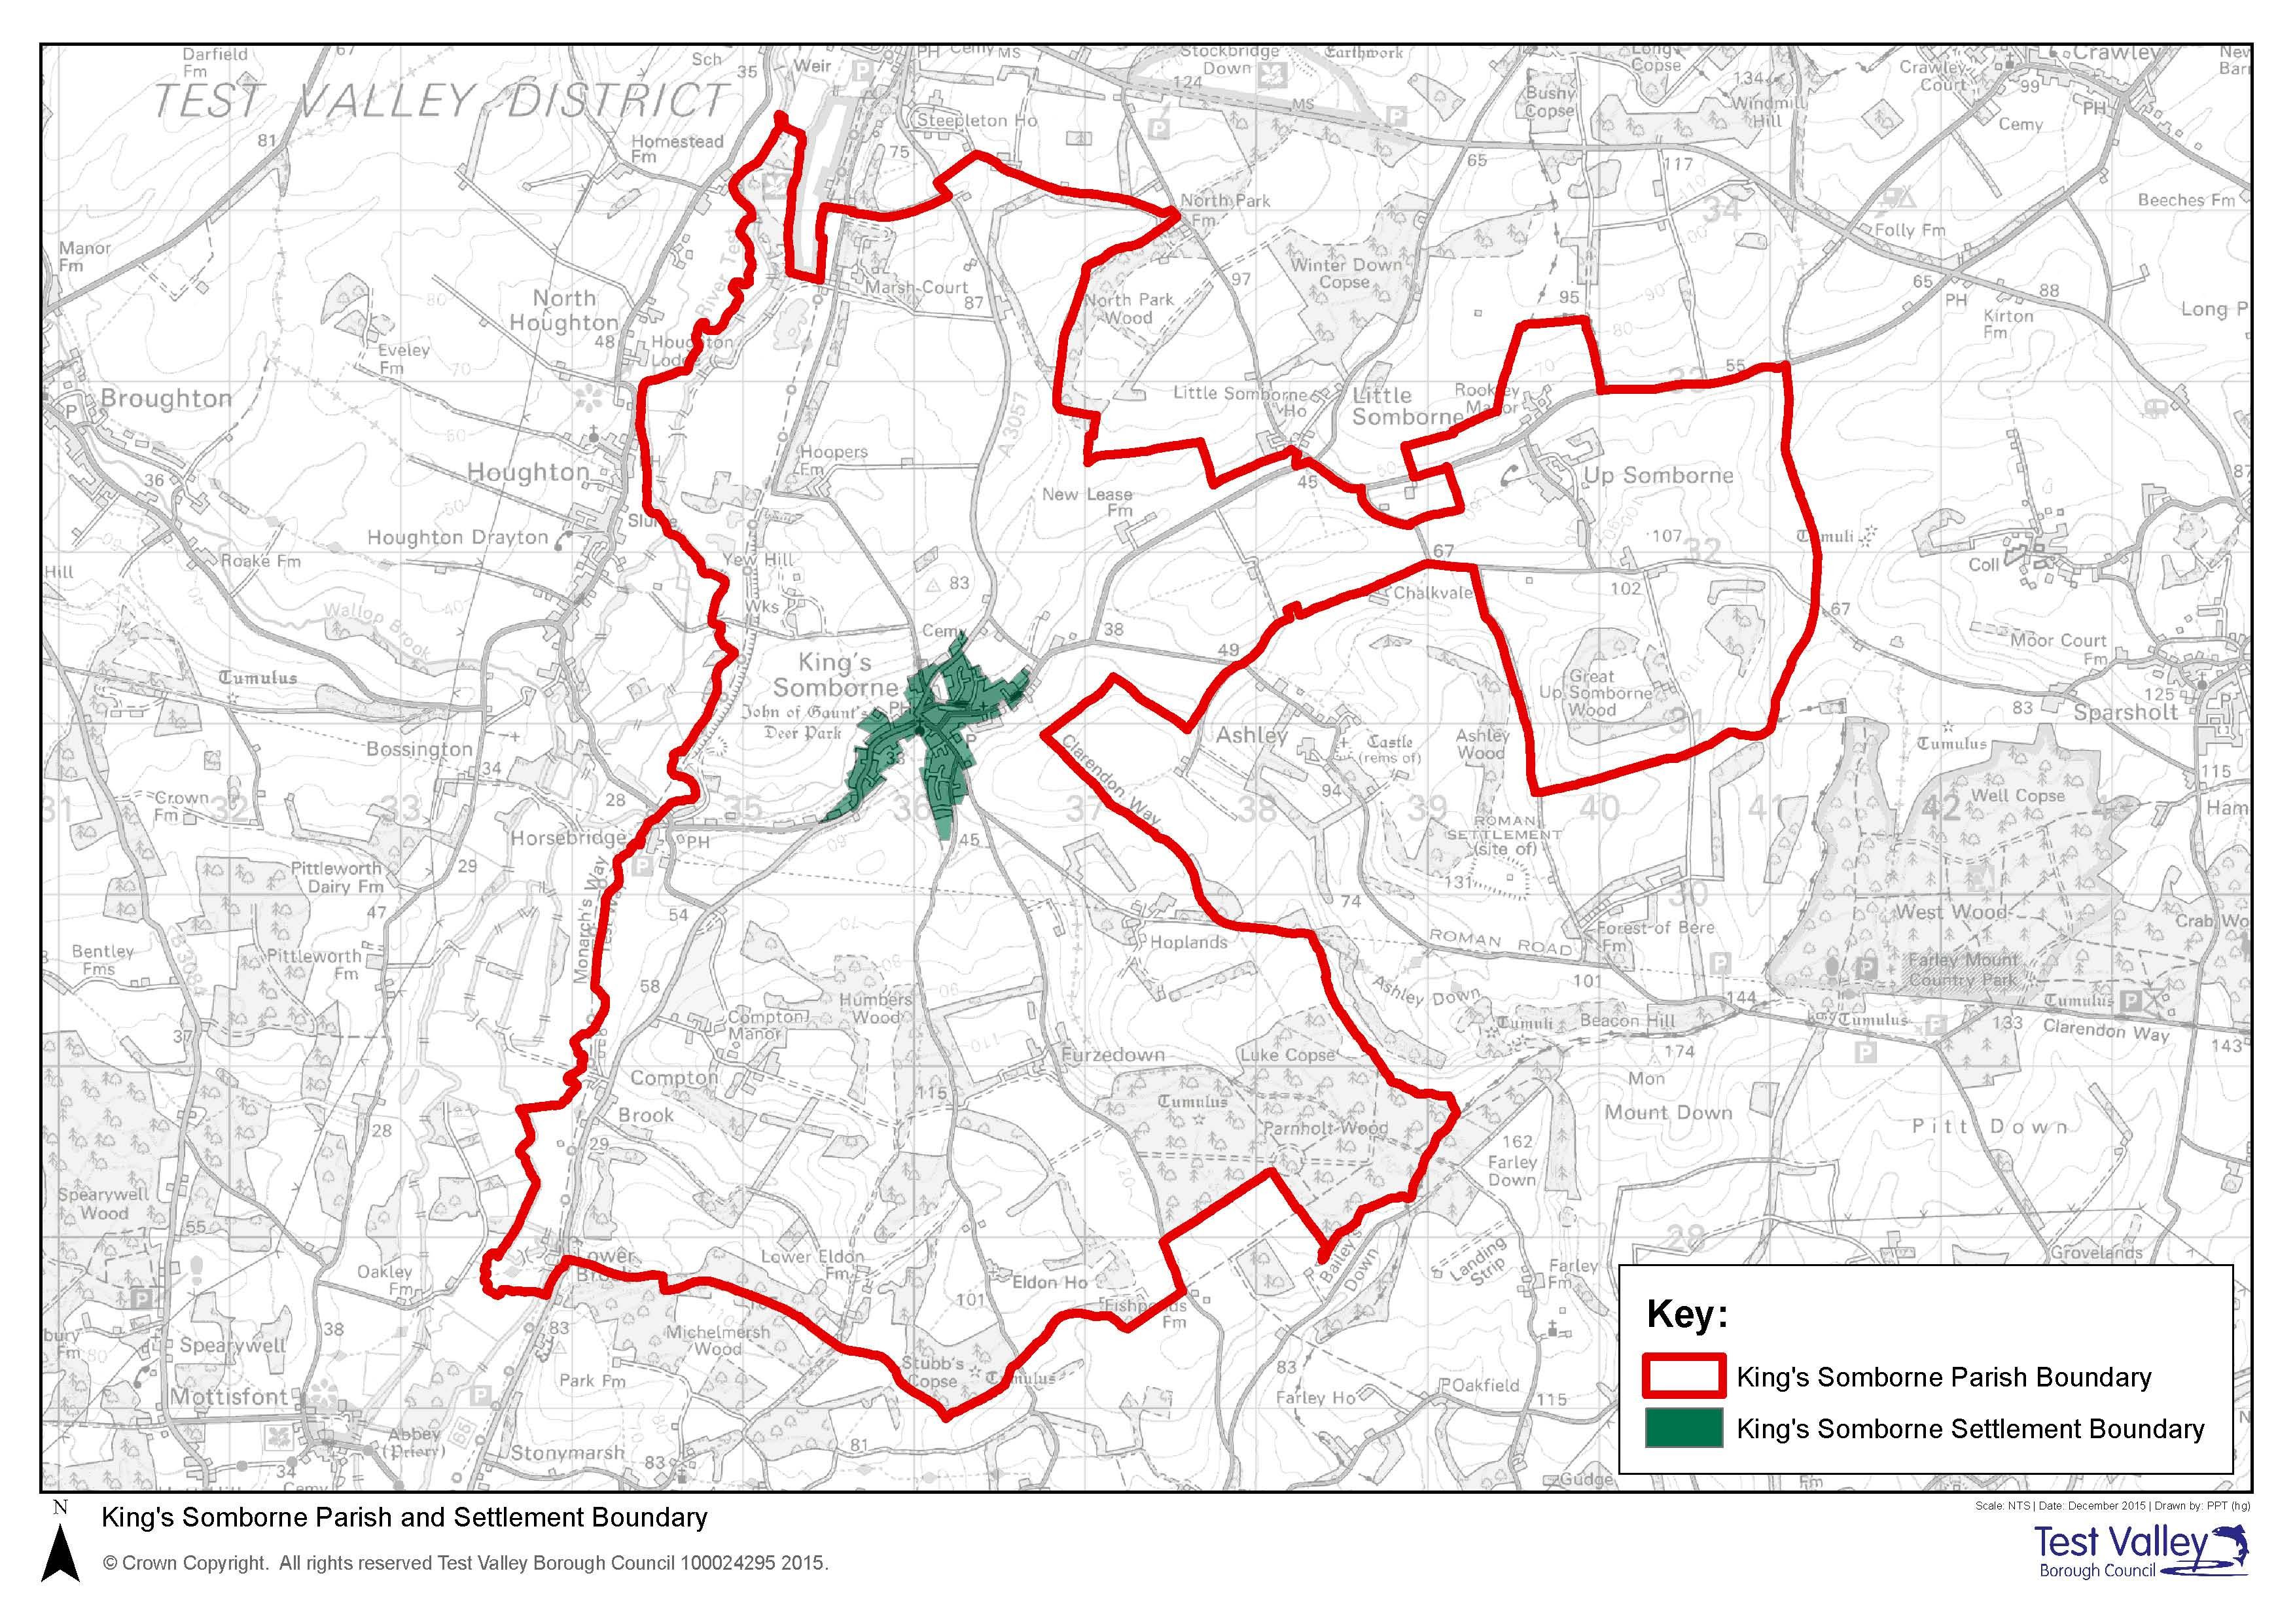 Parish and Settlement